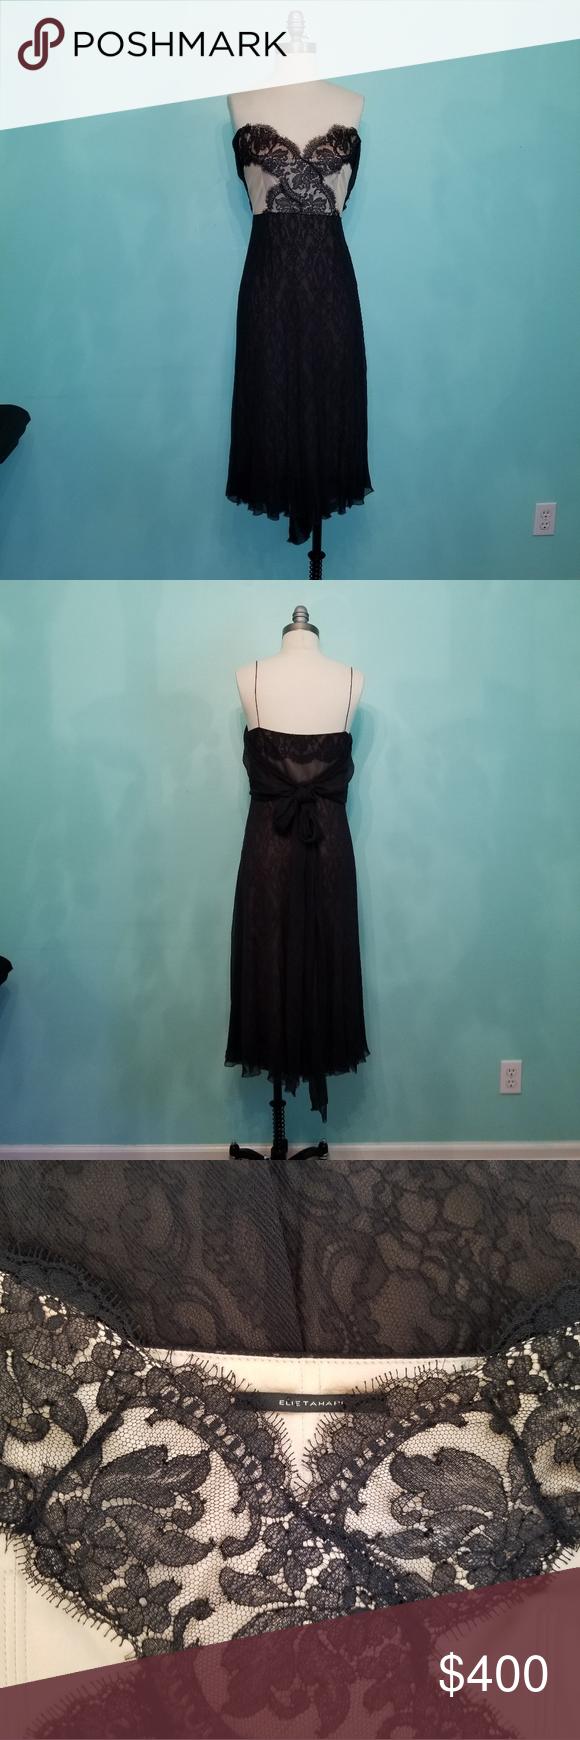 Nwt Elie Tahari Cocktail Dress Dresses Elie Tahari Dresses Elie Tahari [ 1740 x 580 Pixel ]